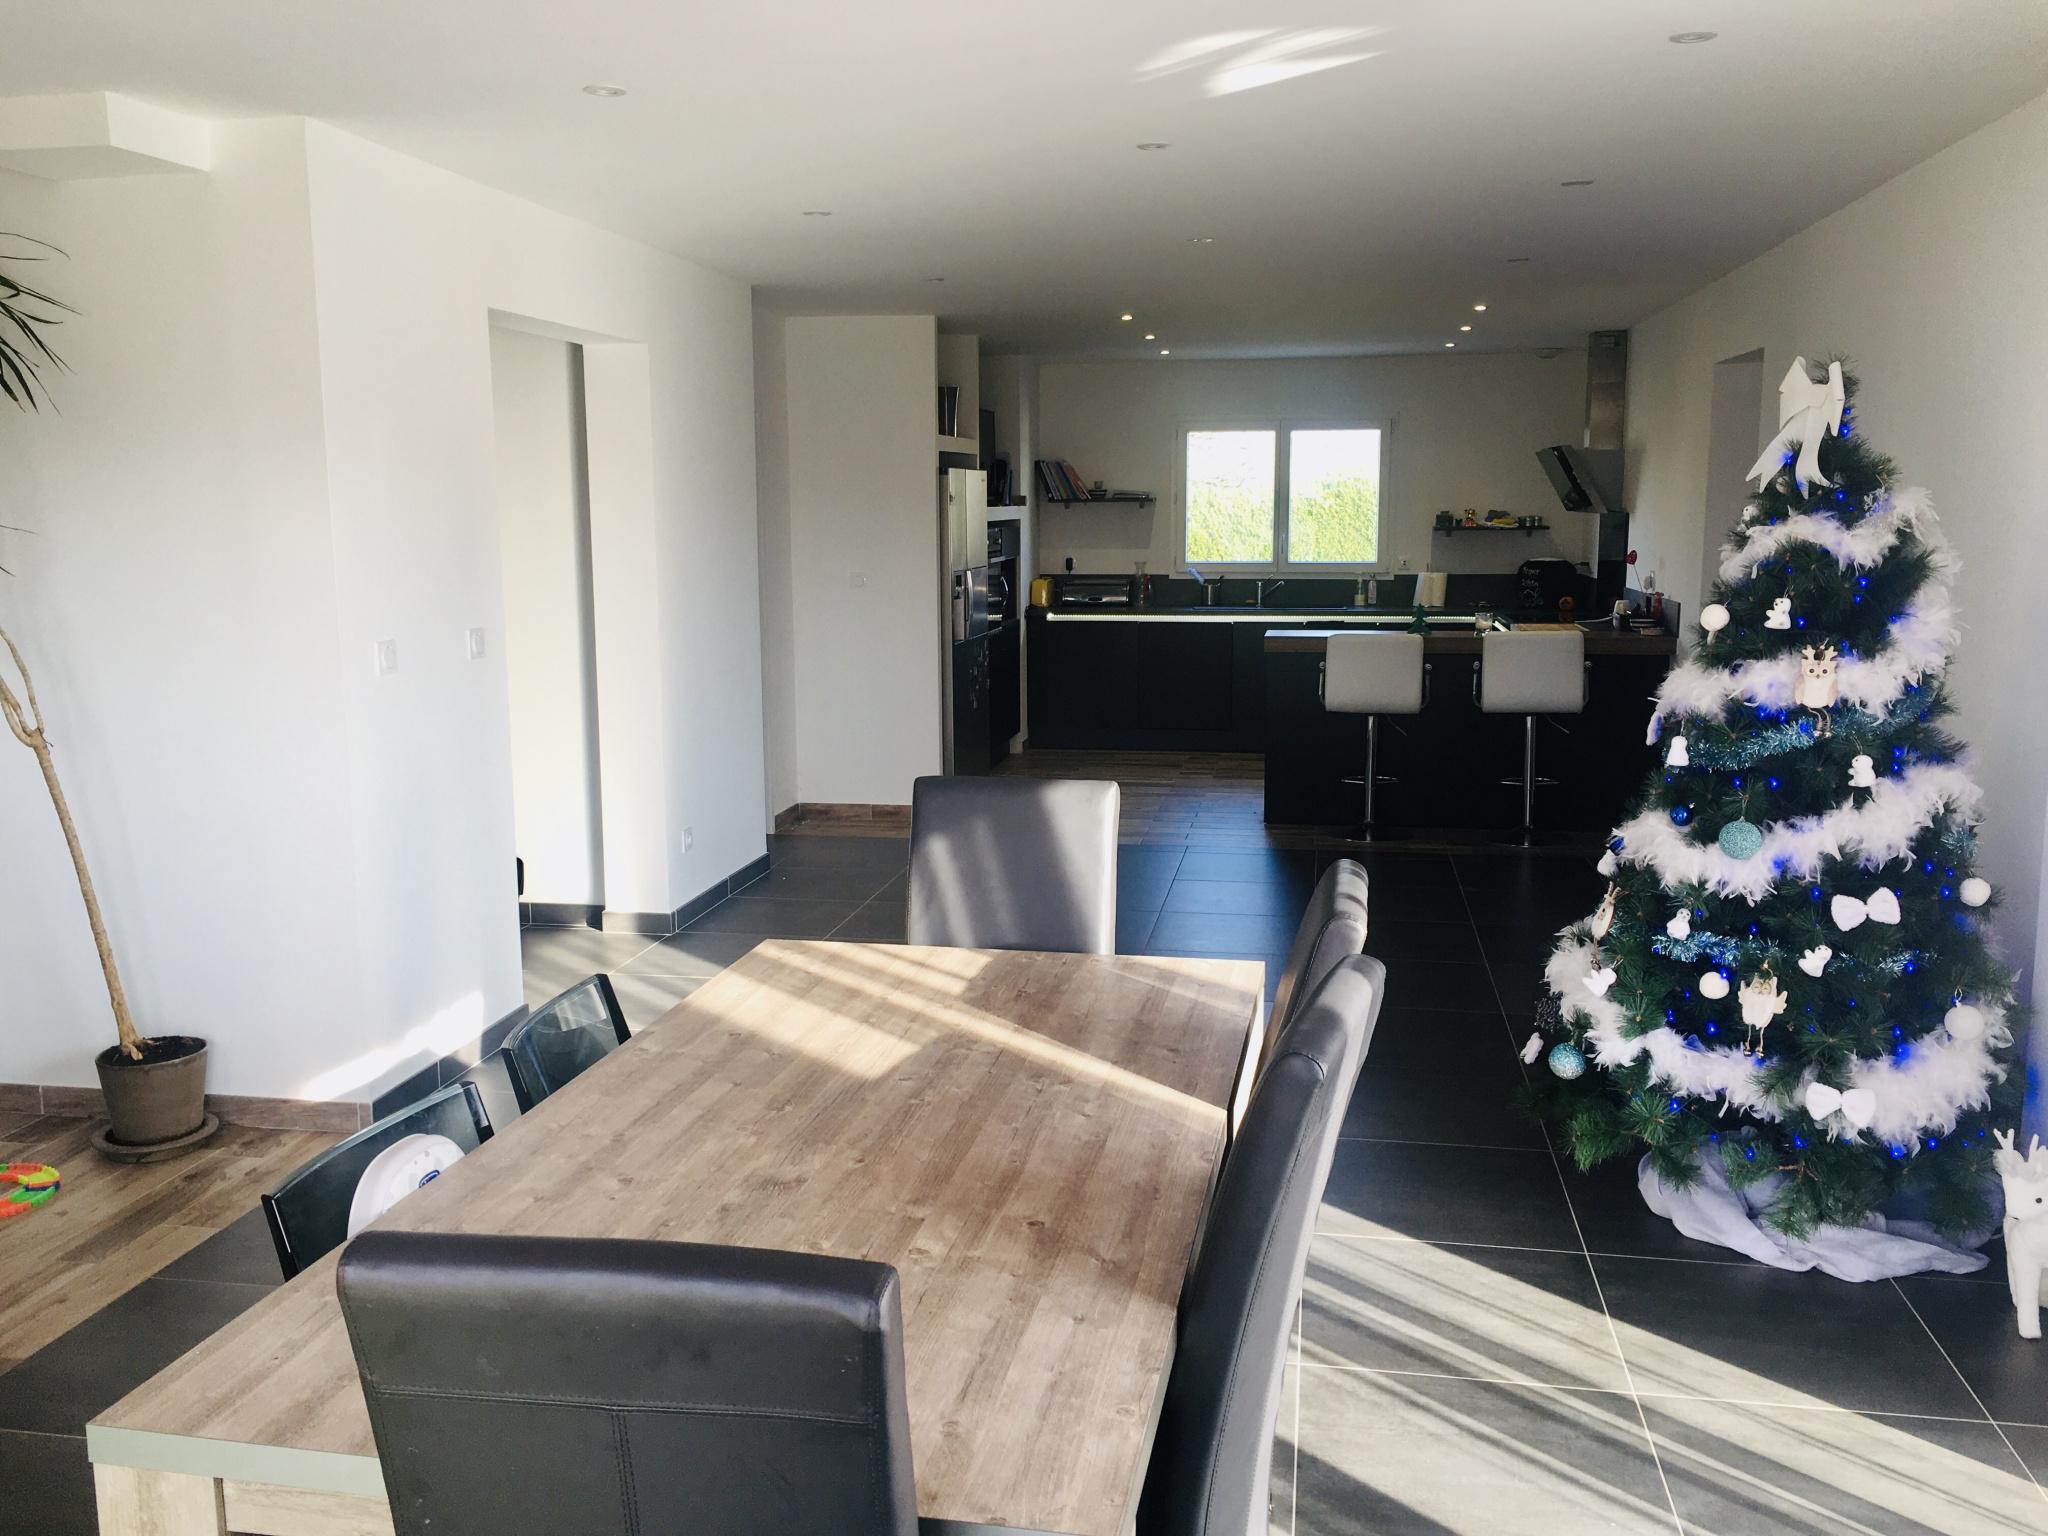 maison-moderne-basse-consomation-d-energie